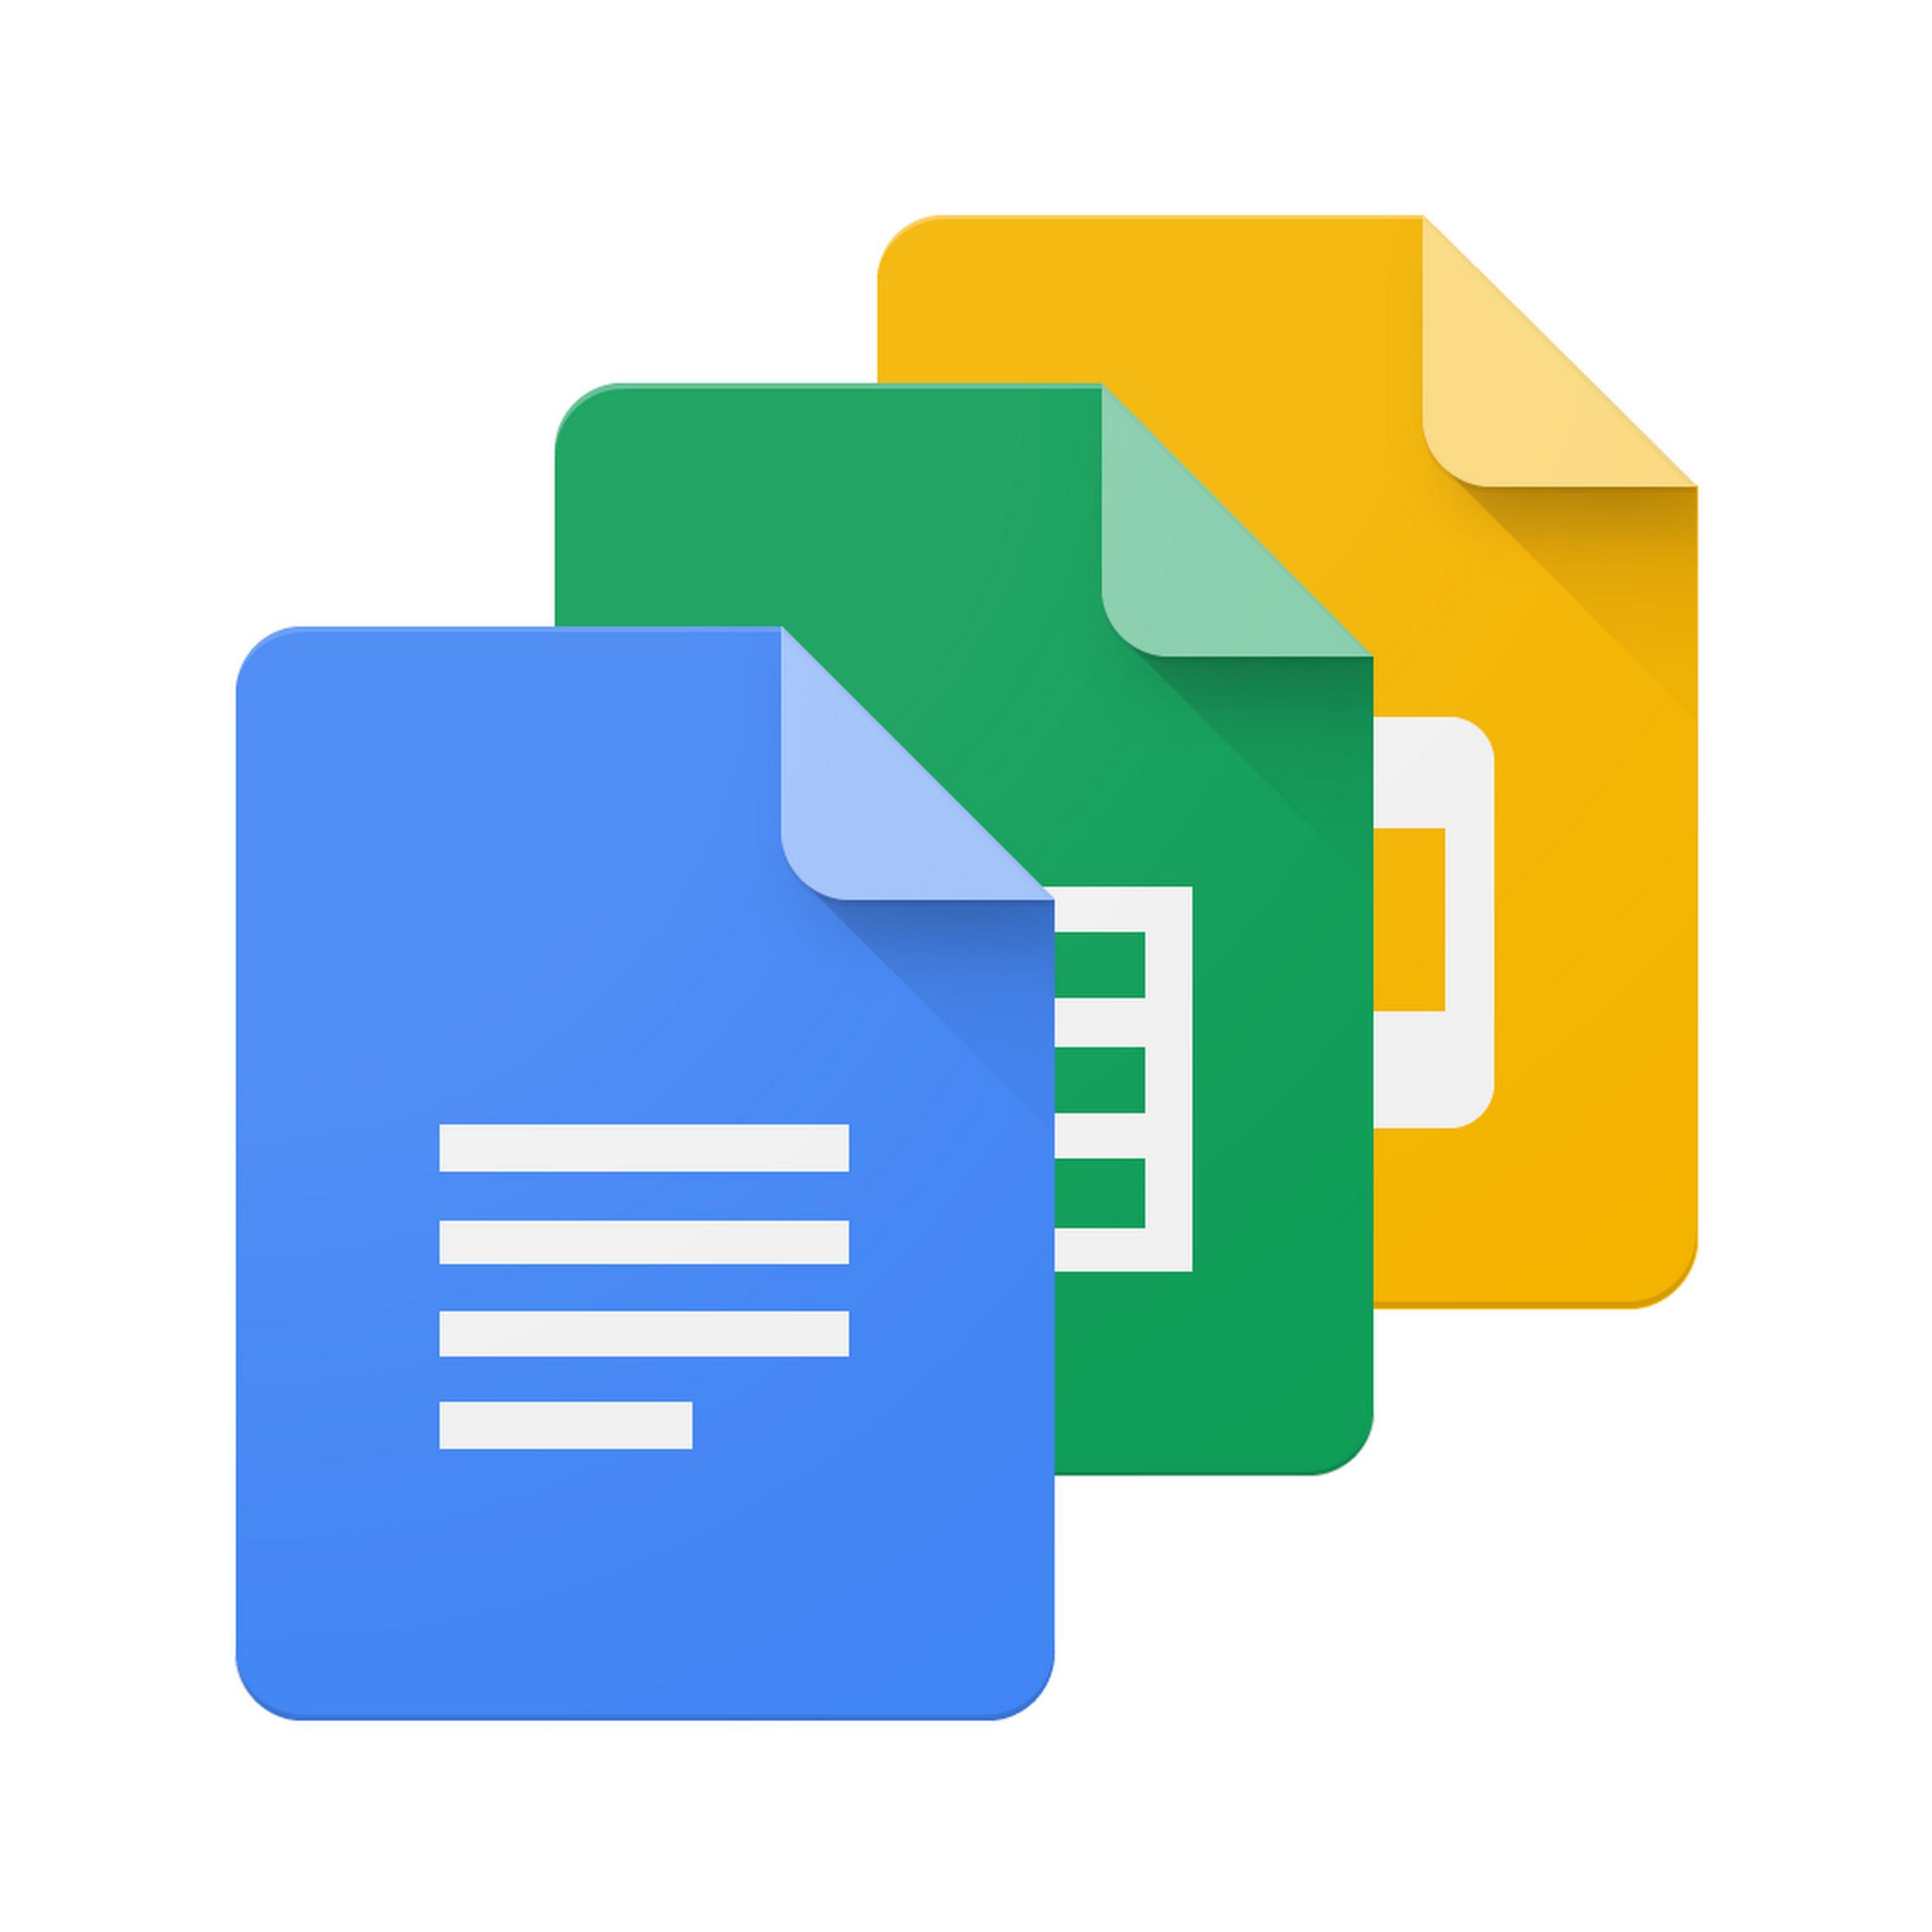 Google_Docs_suite.max-2800x2800.png